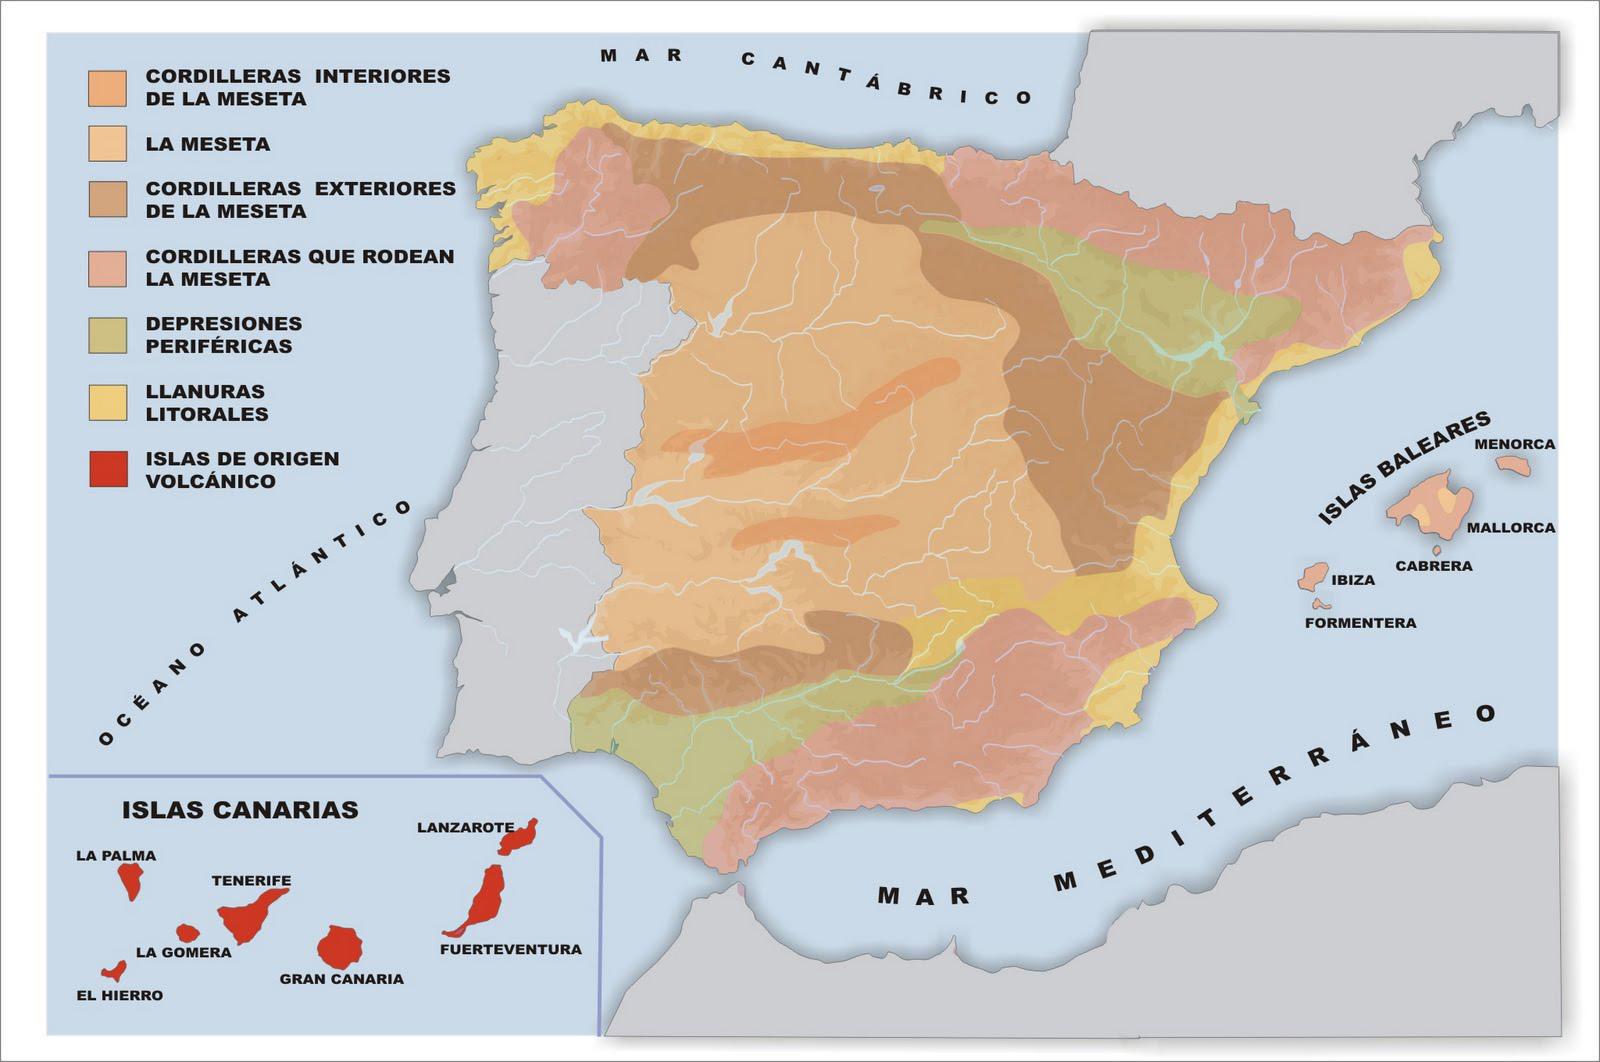 red de bet365 finanz bewertung bet365 fußball-wett-tipps carreteras de españa | Turismo por España